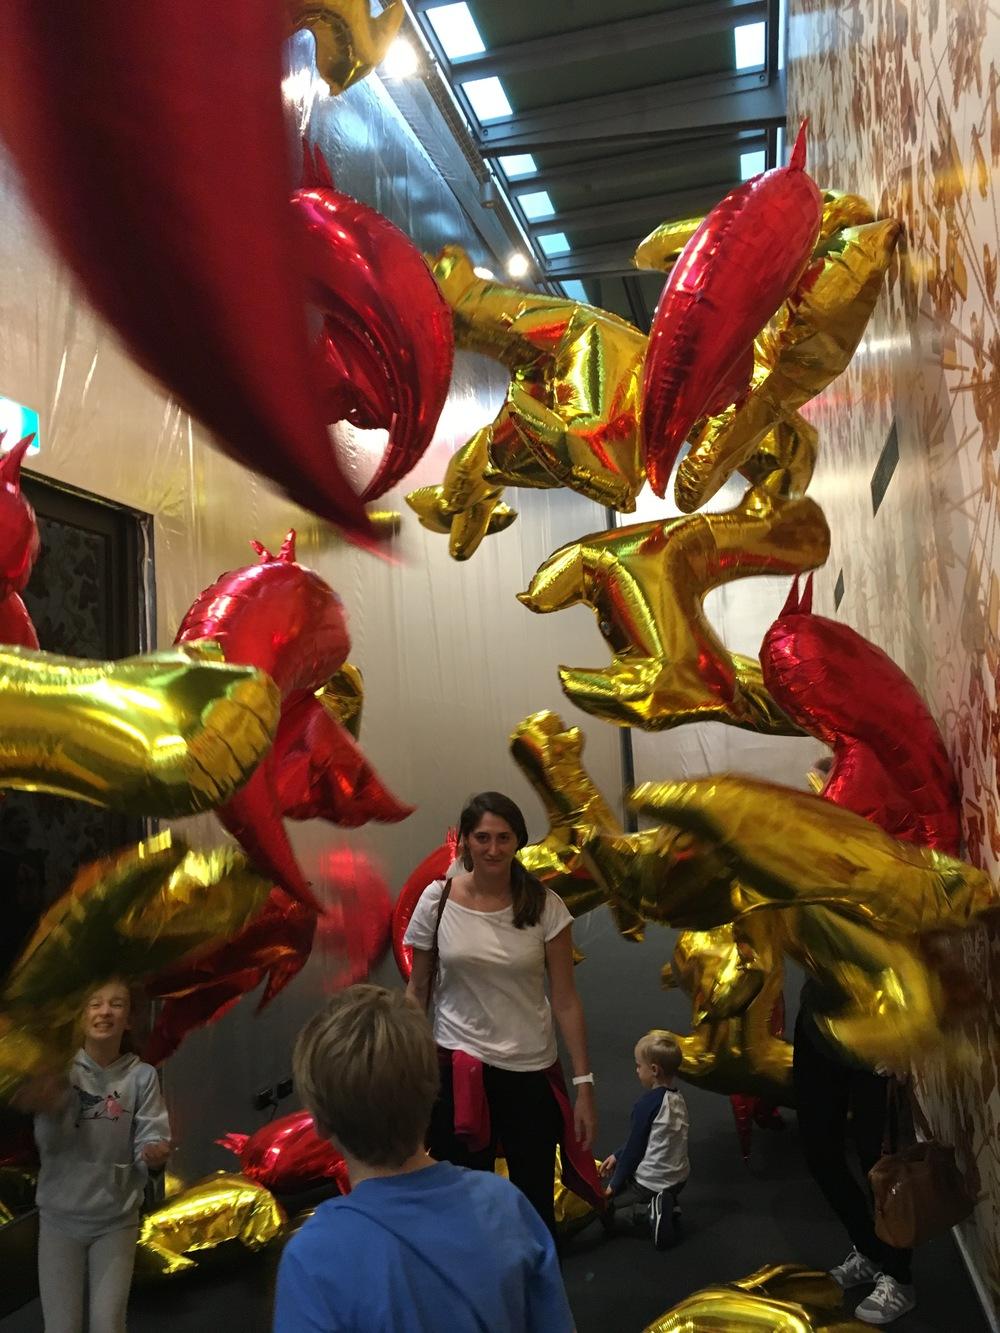 Alex does balloons